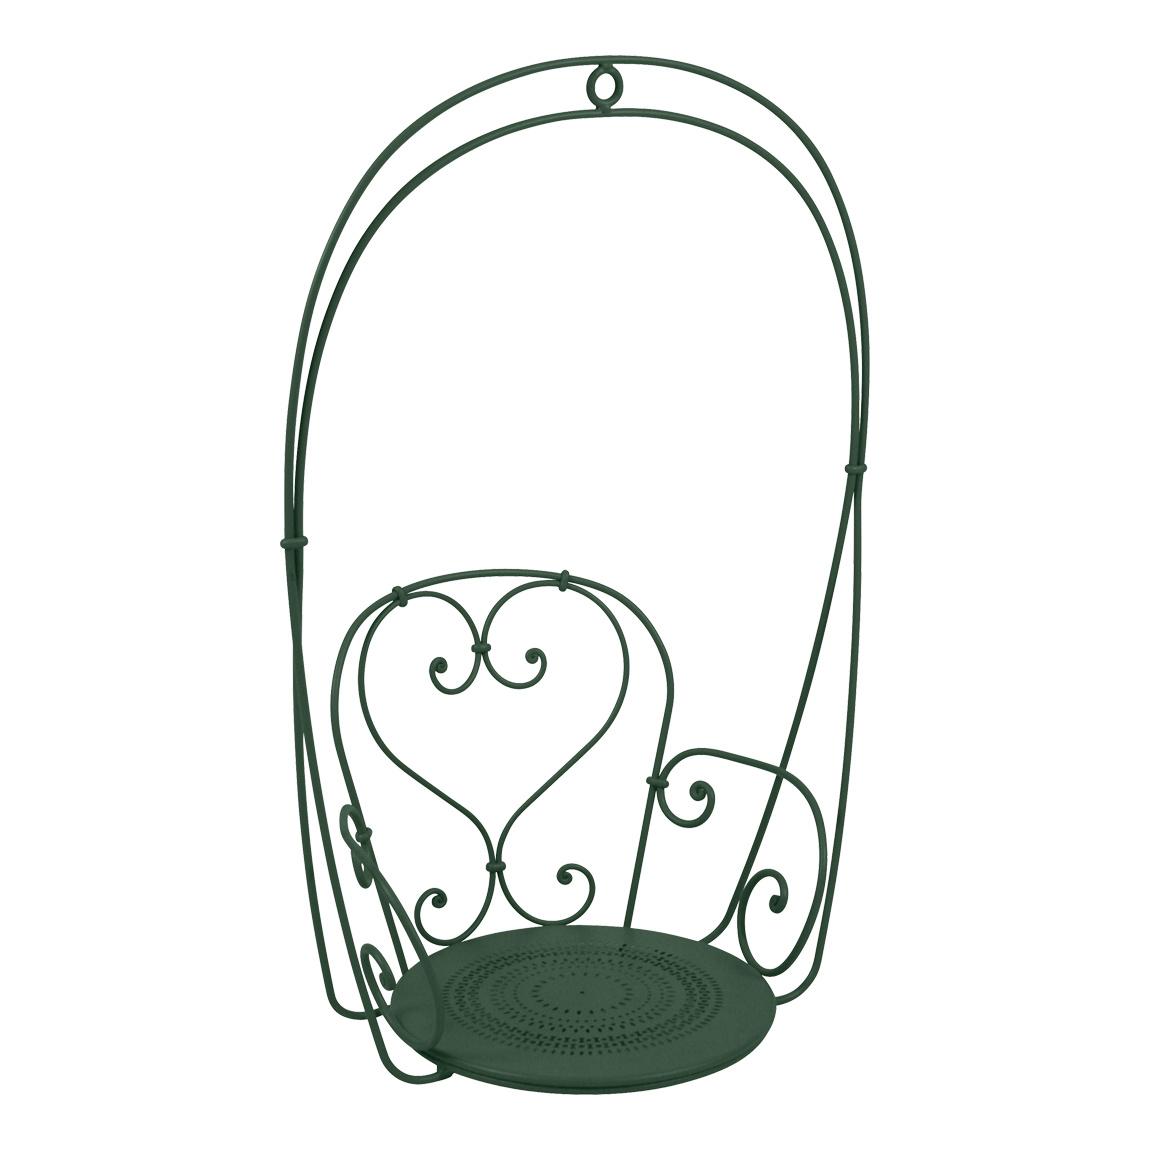 Fermob - 1900 Schaukelsessel - zederngrün/texturiert/BxHxT 74x110x54cm/UV-beständig | Wohnzimmer > Sessel > Schaukelsessel | Fermob